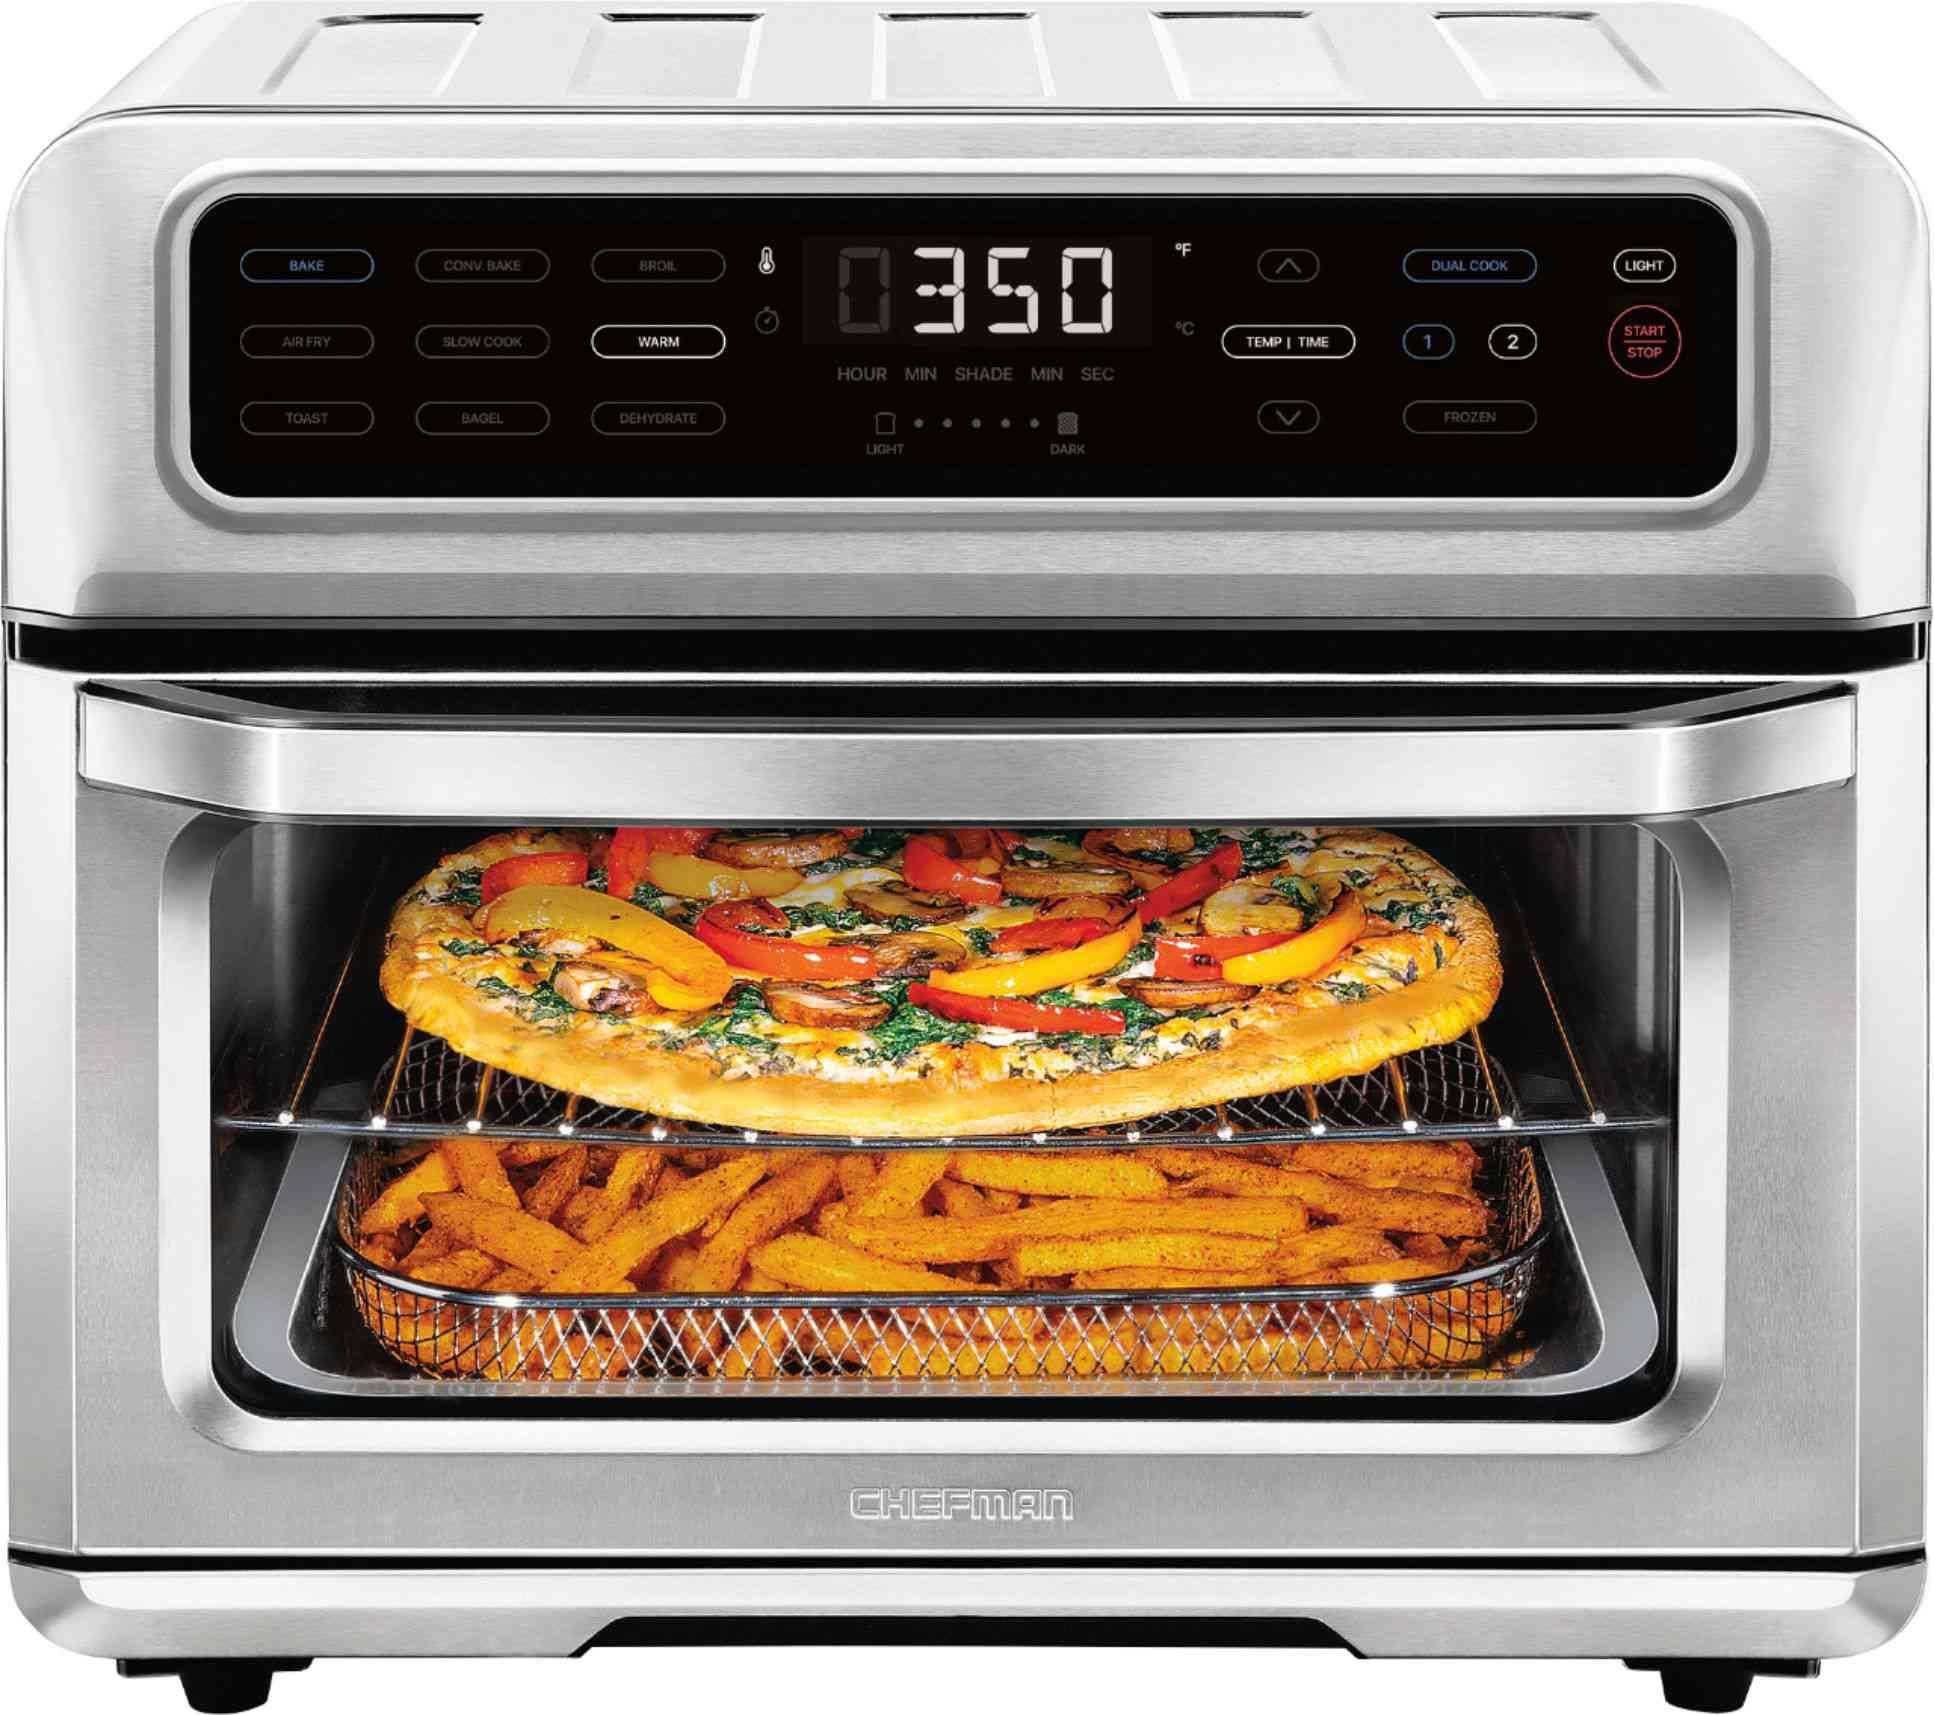 Chefman Toast-Air Dual Function Air Fryer